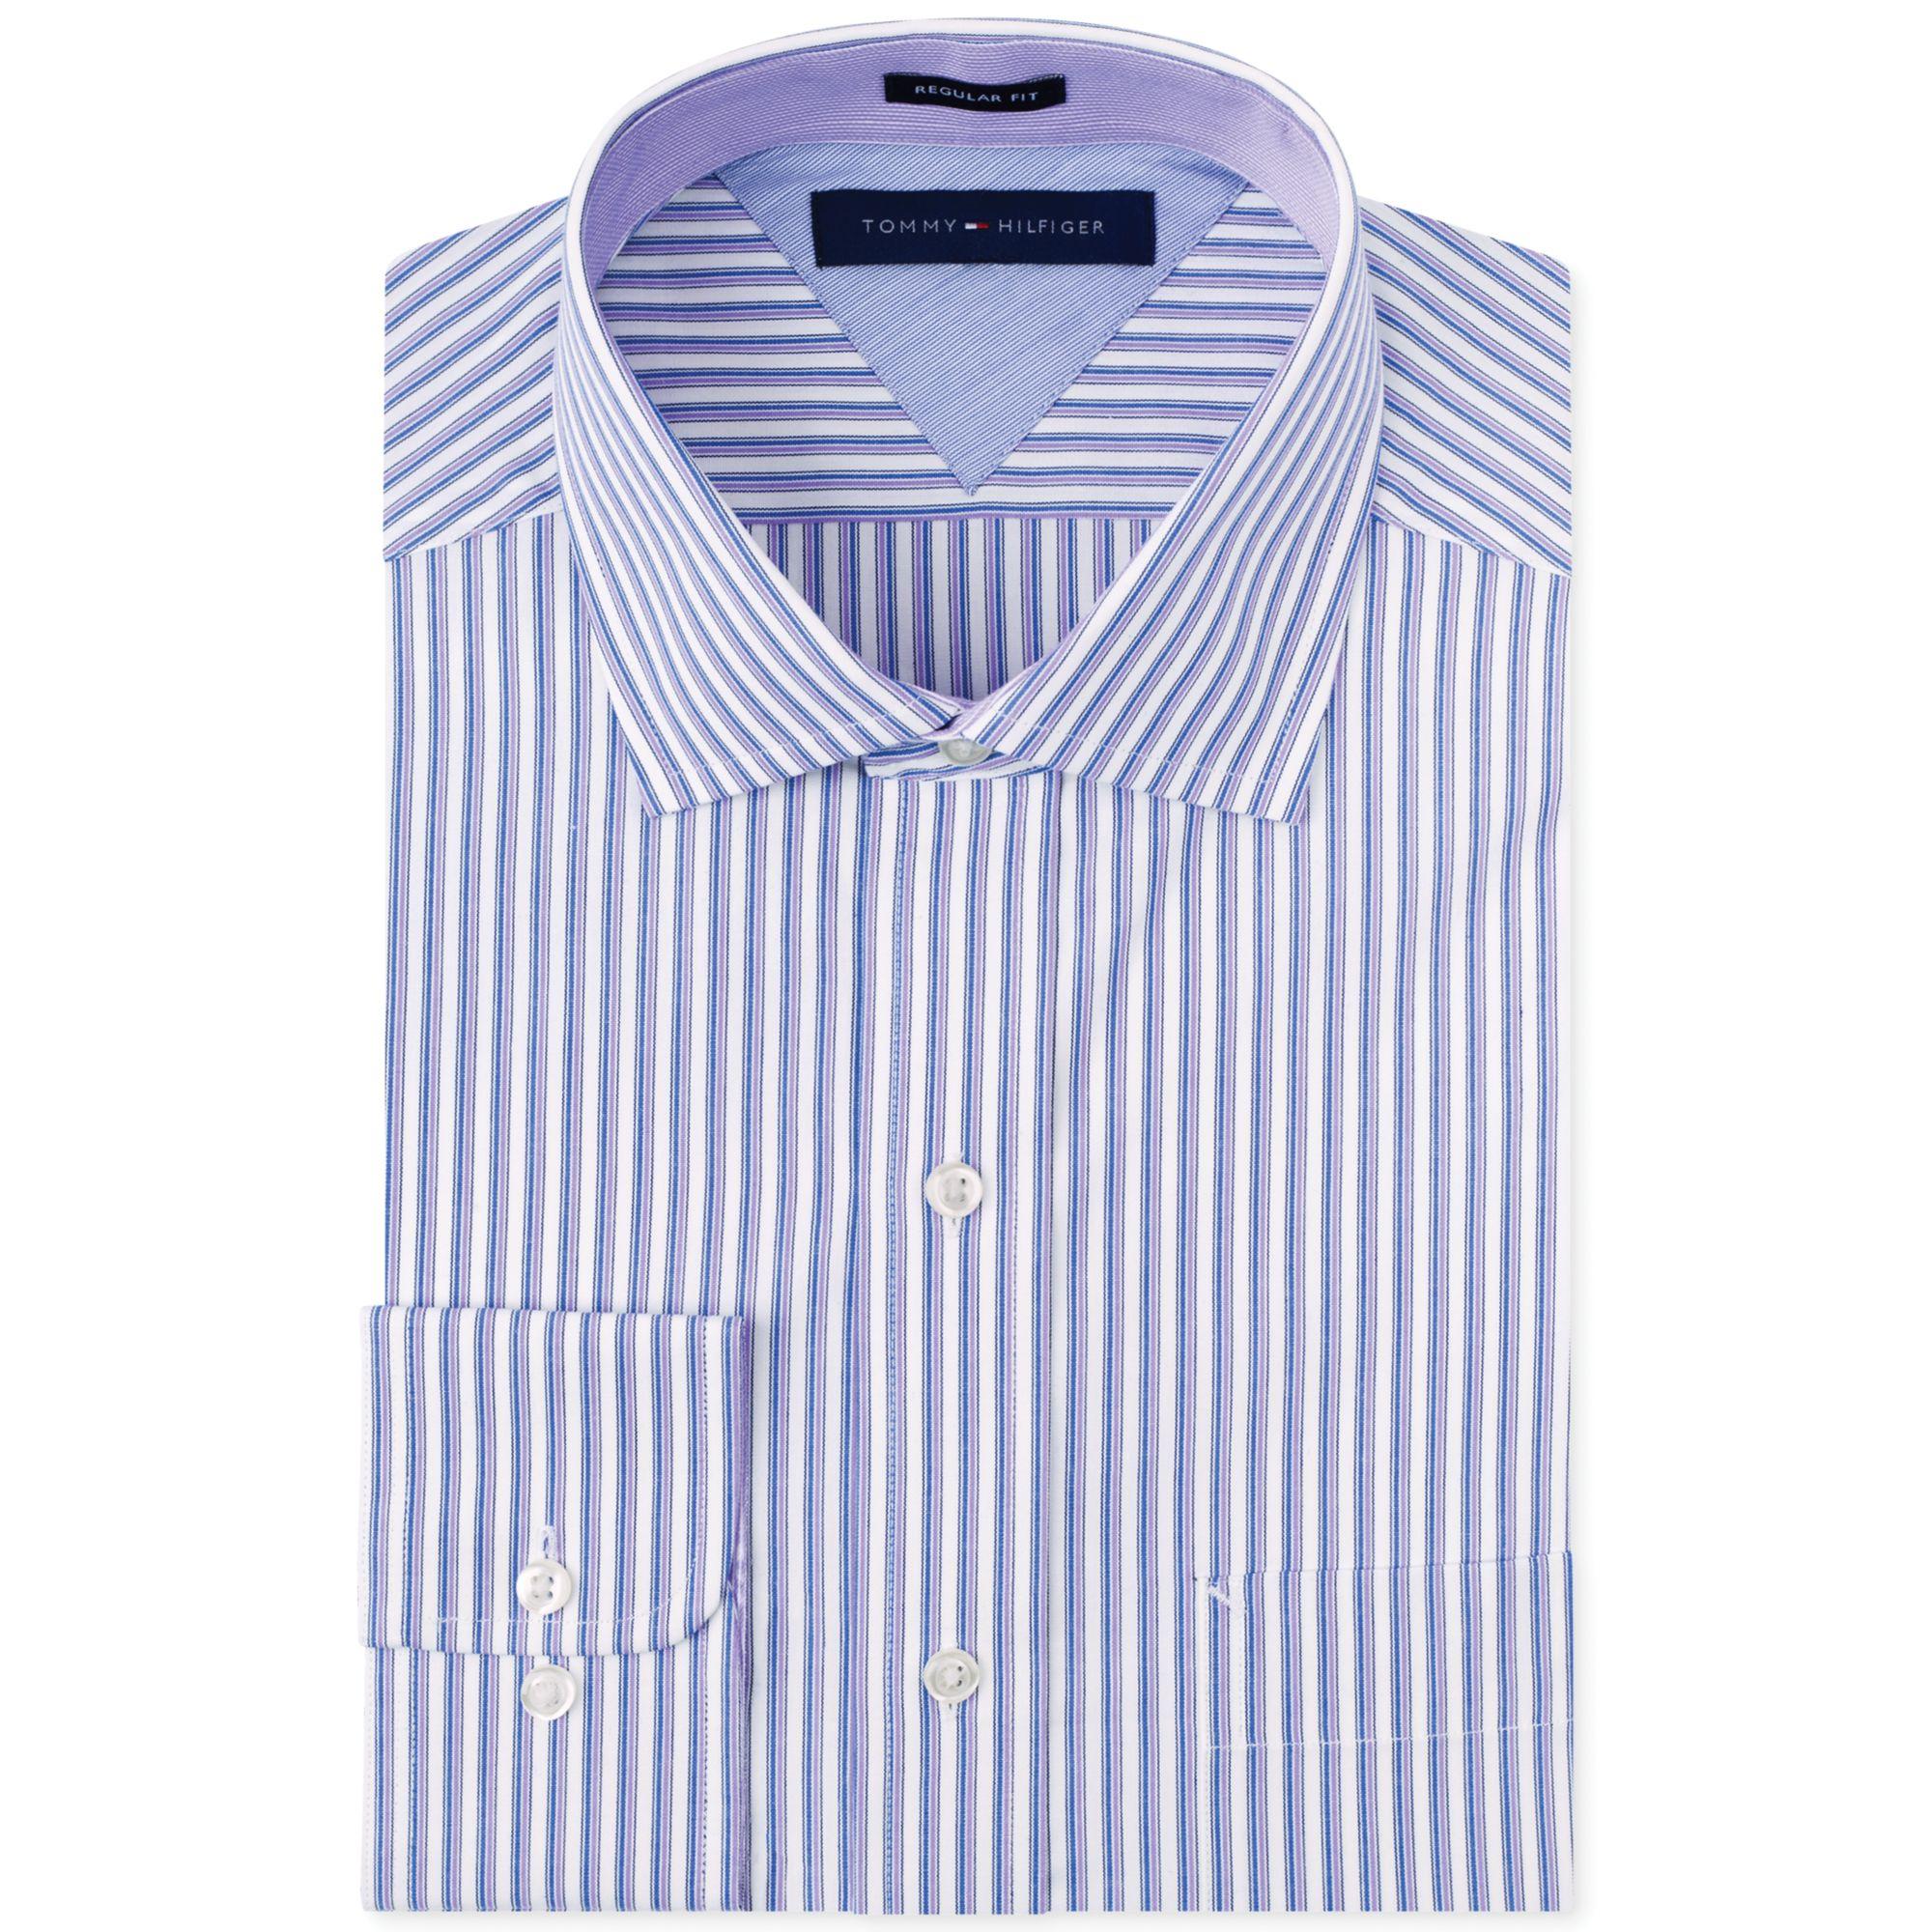 Lyst tommy hilfiger purple stripe dress shirt in purple for Tommy hilfiger fitzgerald striped shirt